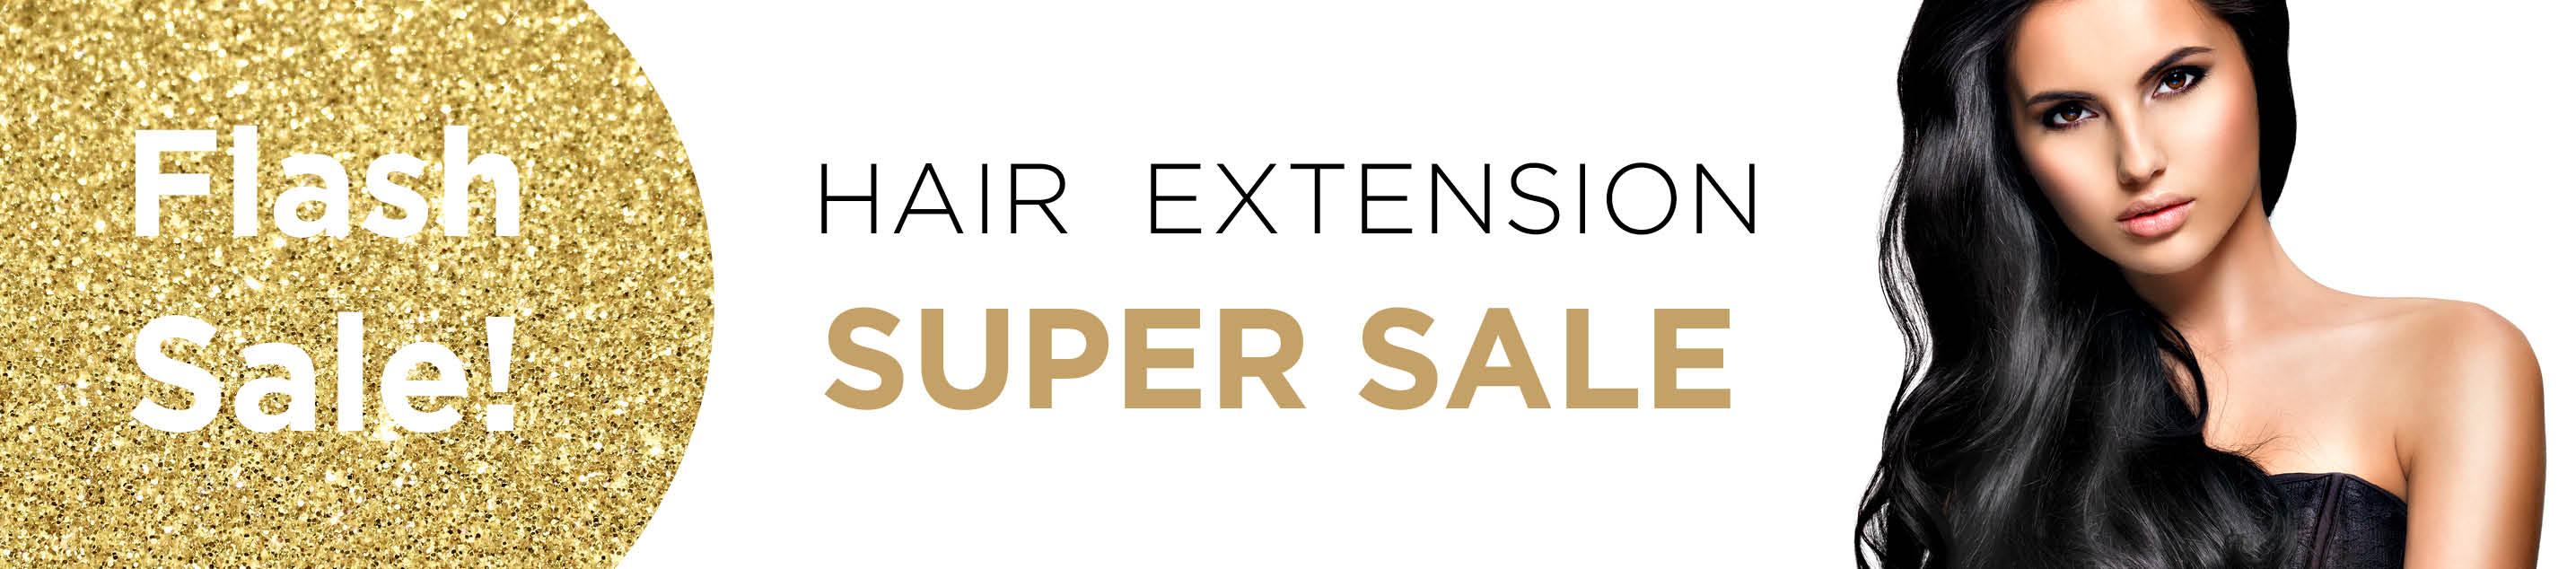 cat-banner-hair-extension-sale-.jpg